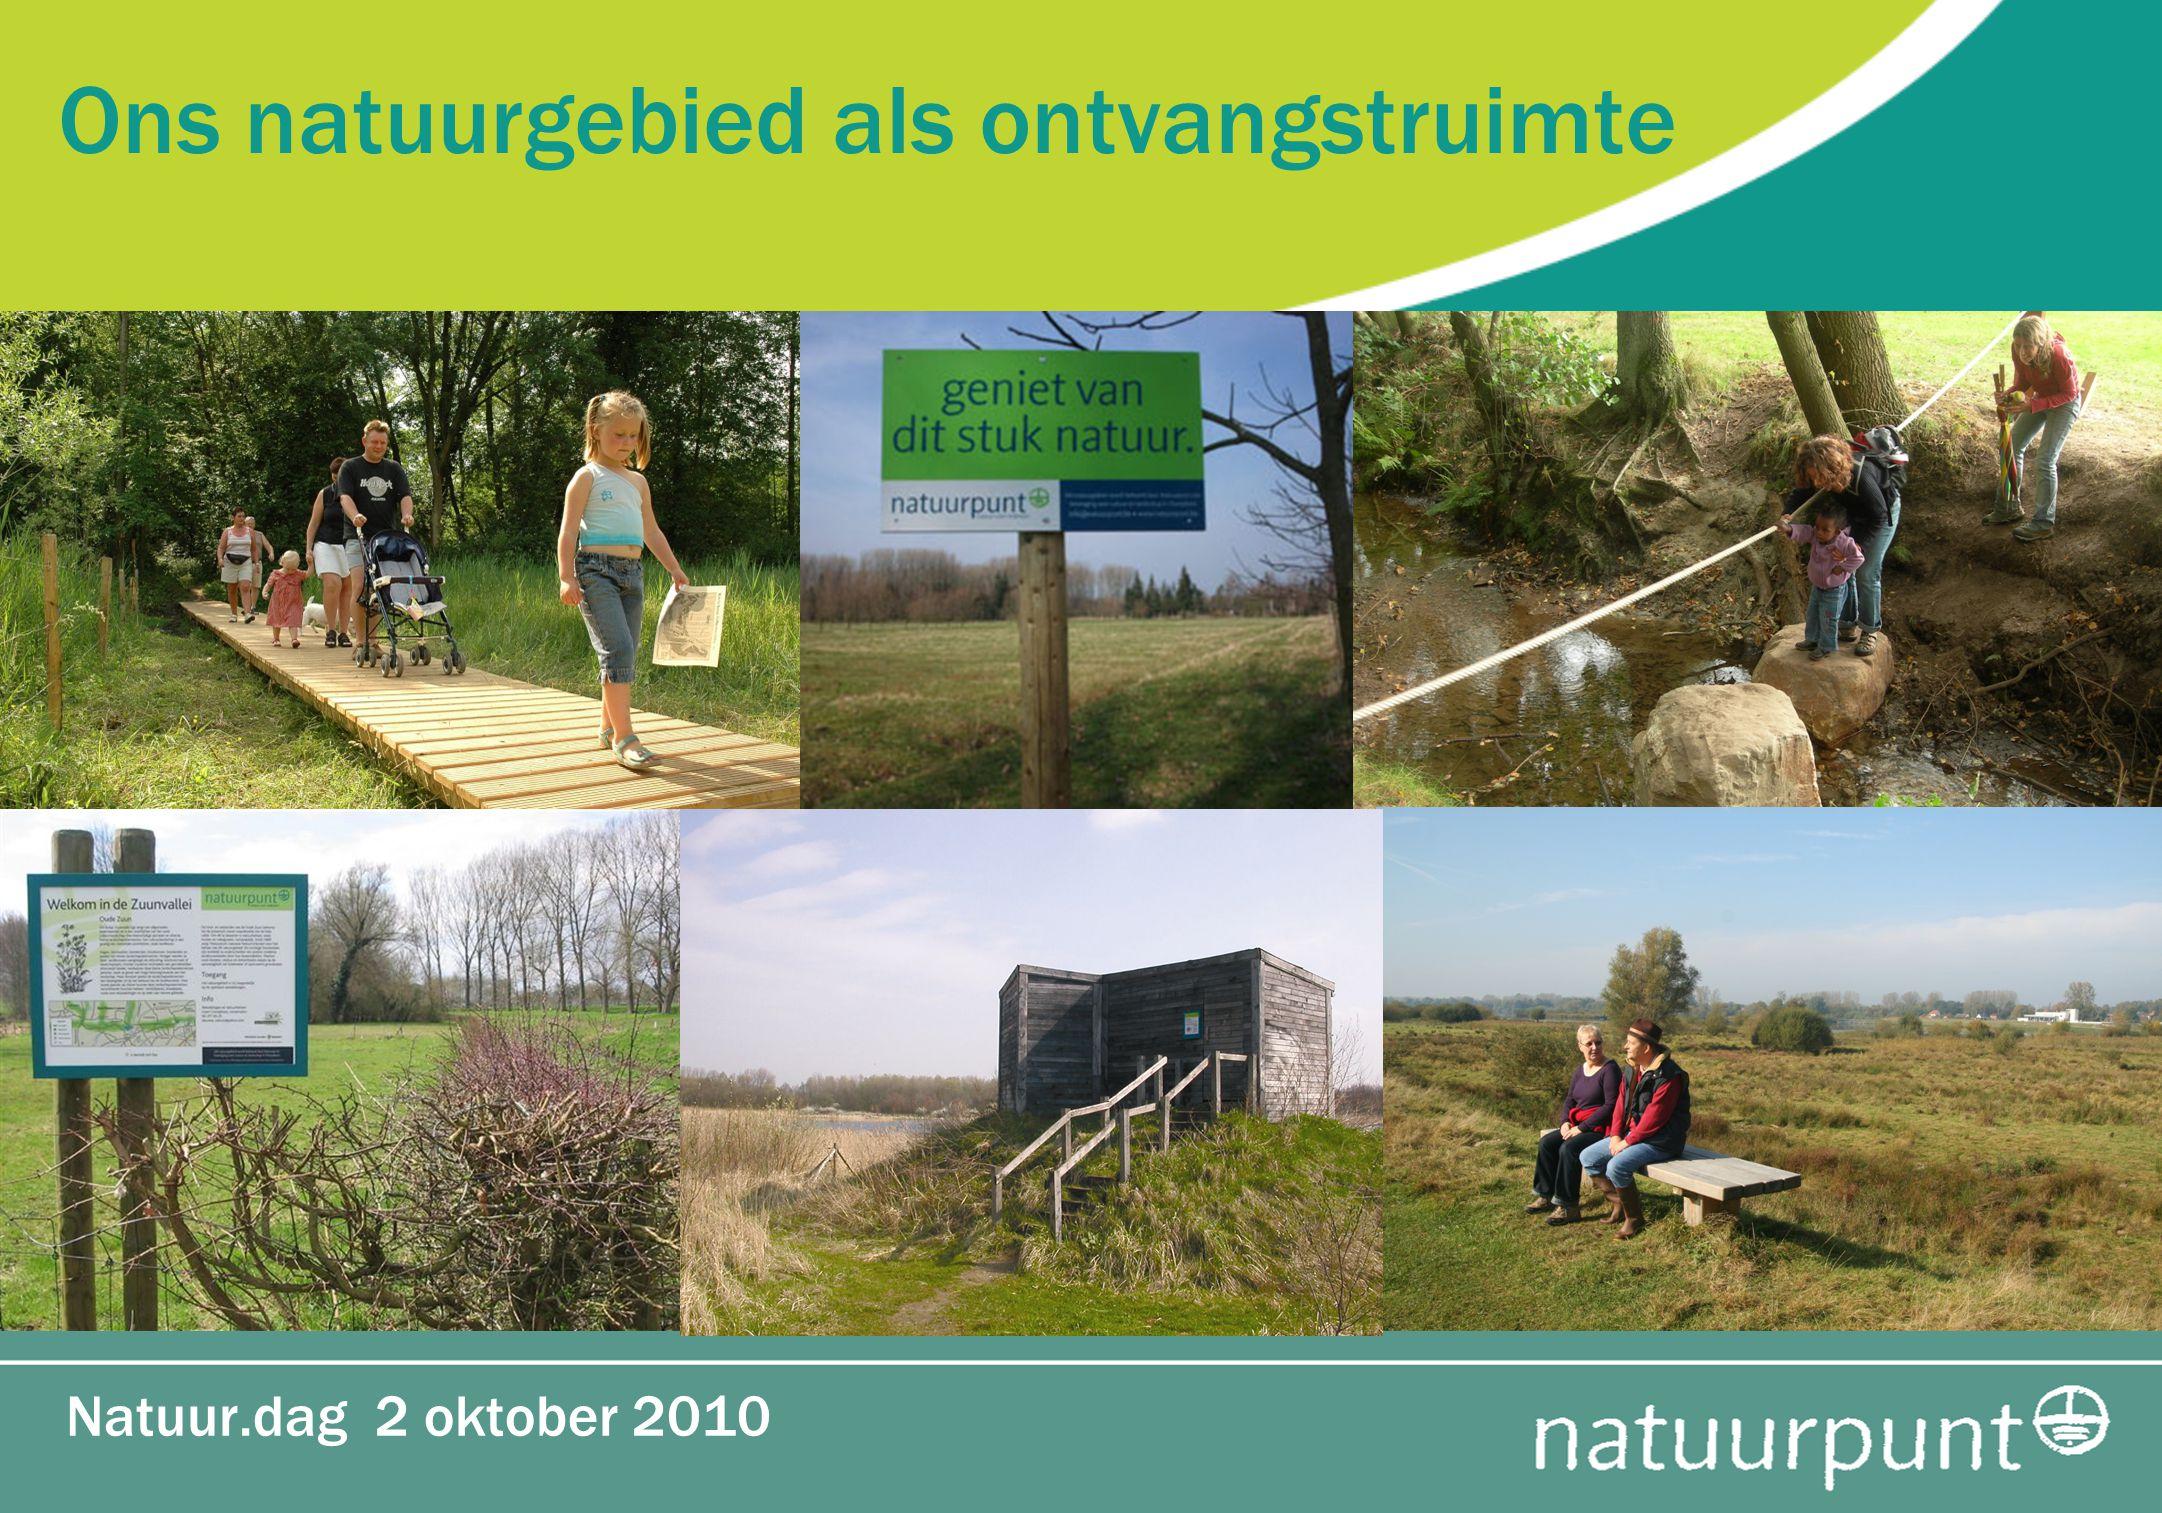 Ons natuurgebied als ontvangstruimte Natuur.dag 2 oktober 2010